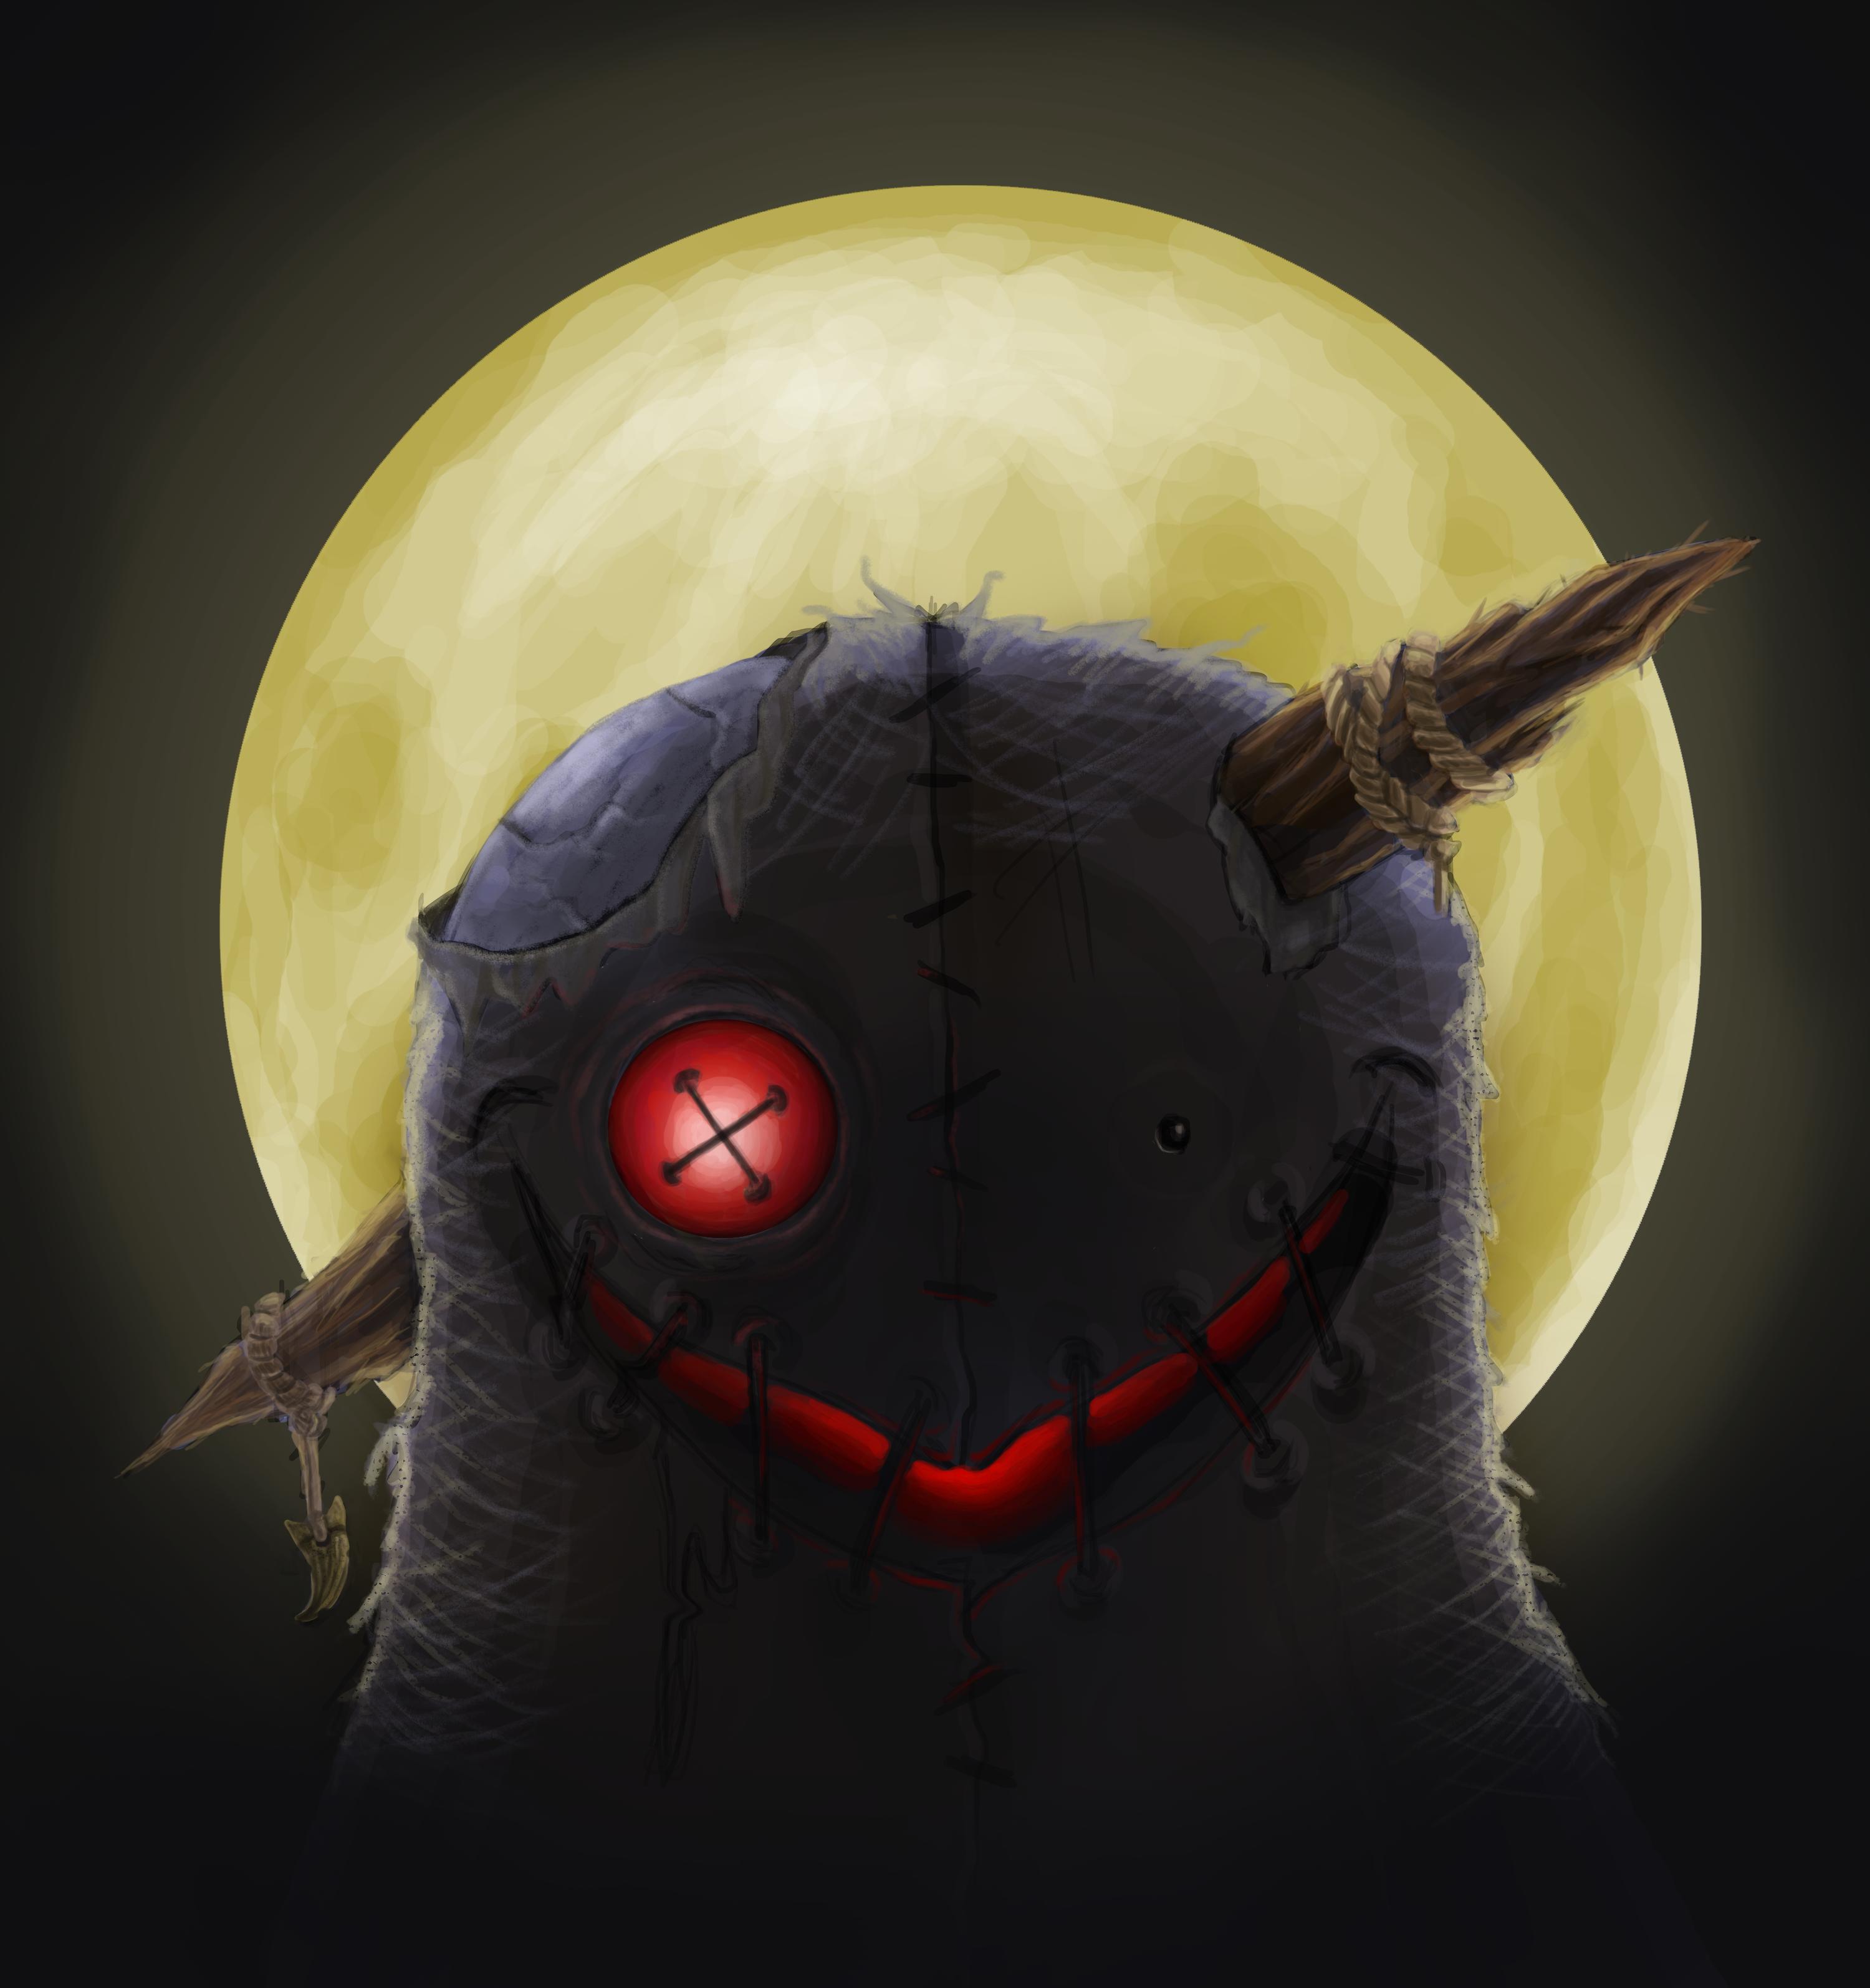 Stitching Under the Moon